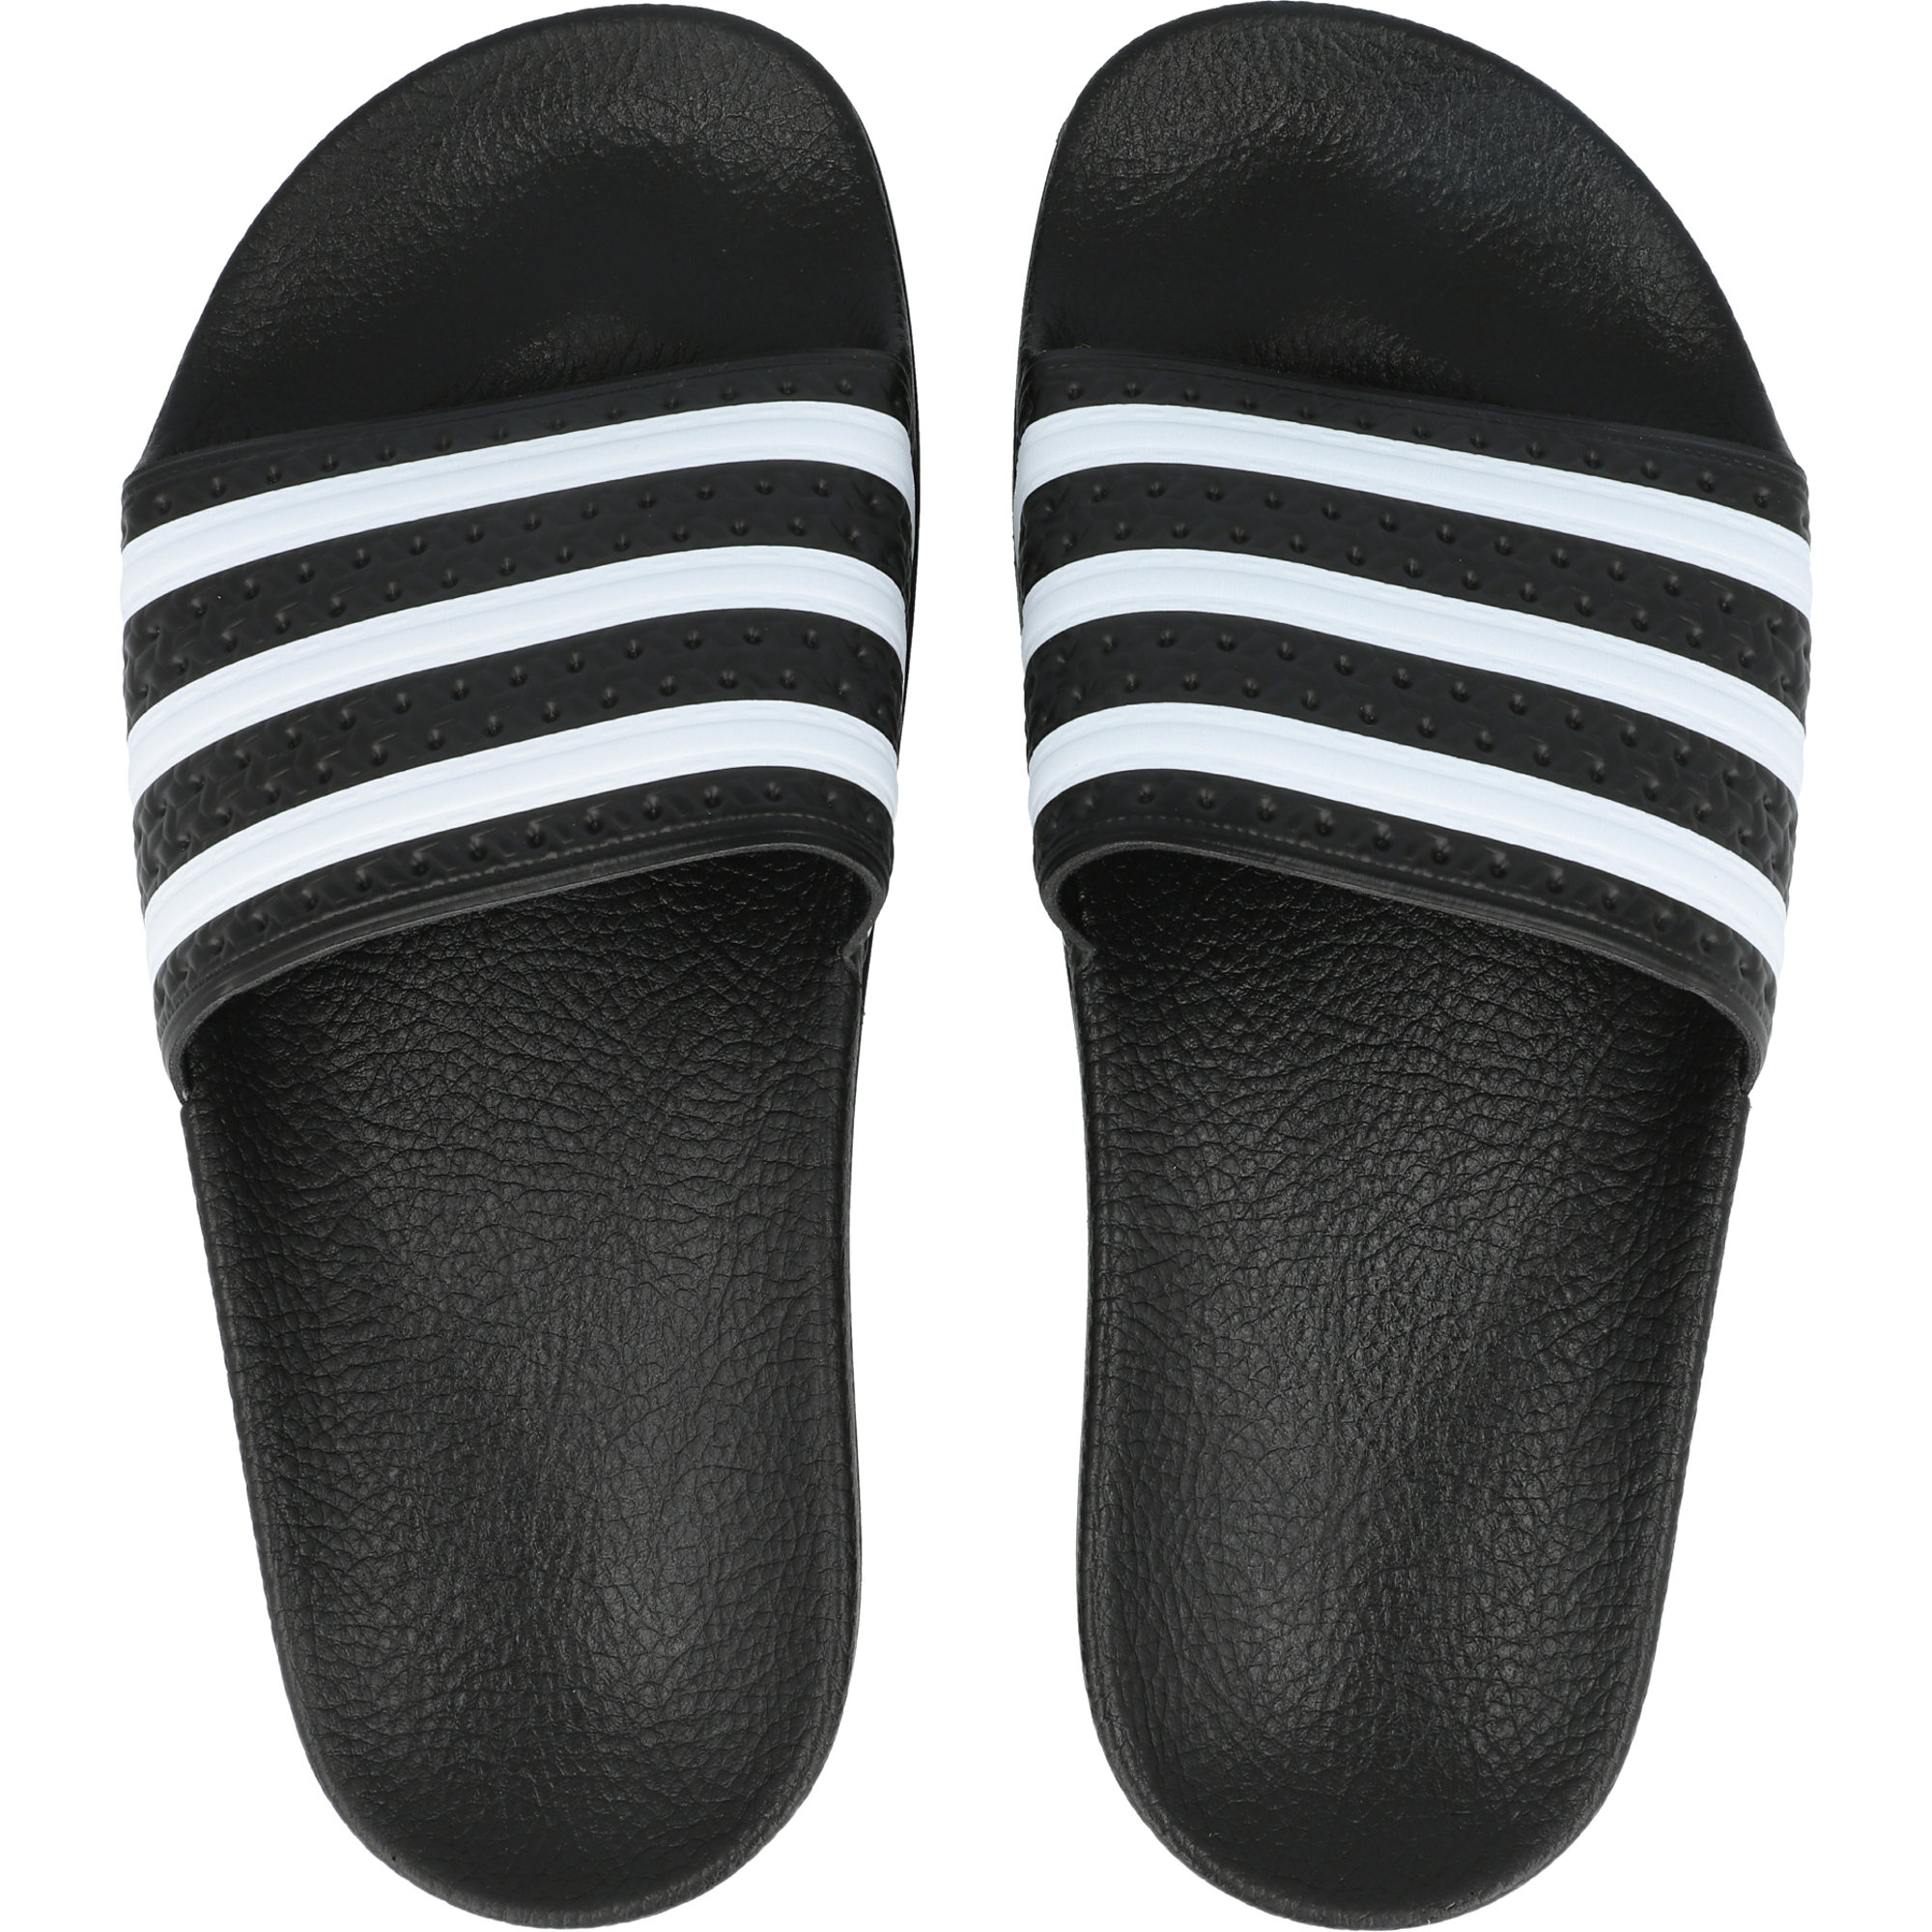 adidas Originals adilette Core Black/White Synthetic